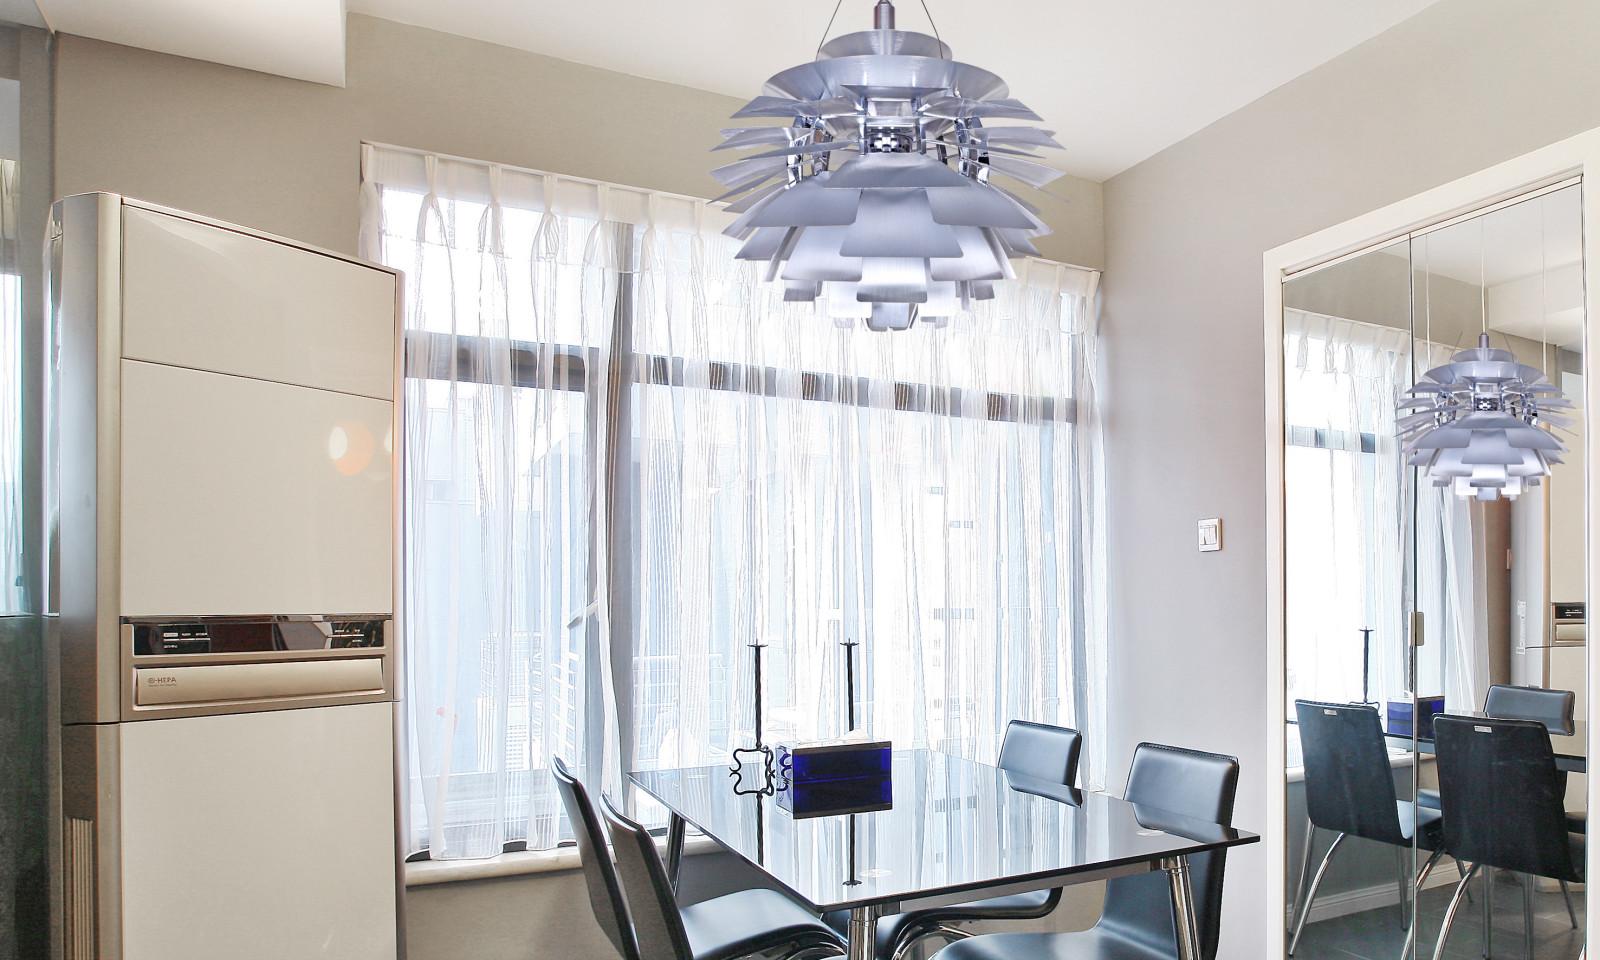 Artichoke Light Medium The Natural Furniture Company Ltd